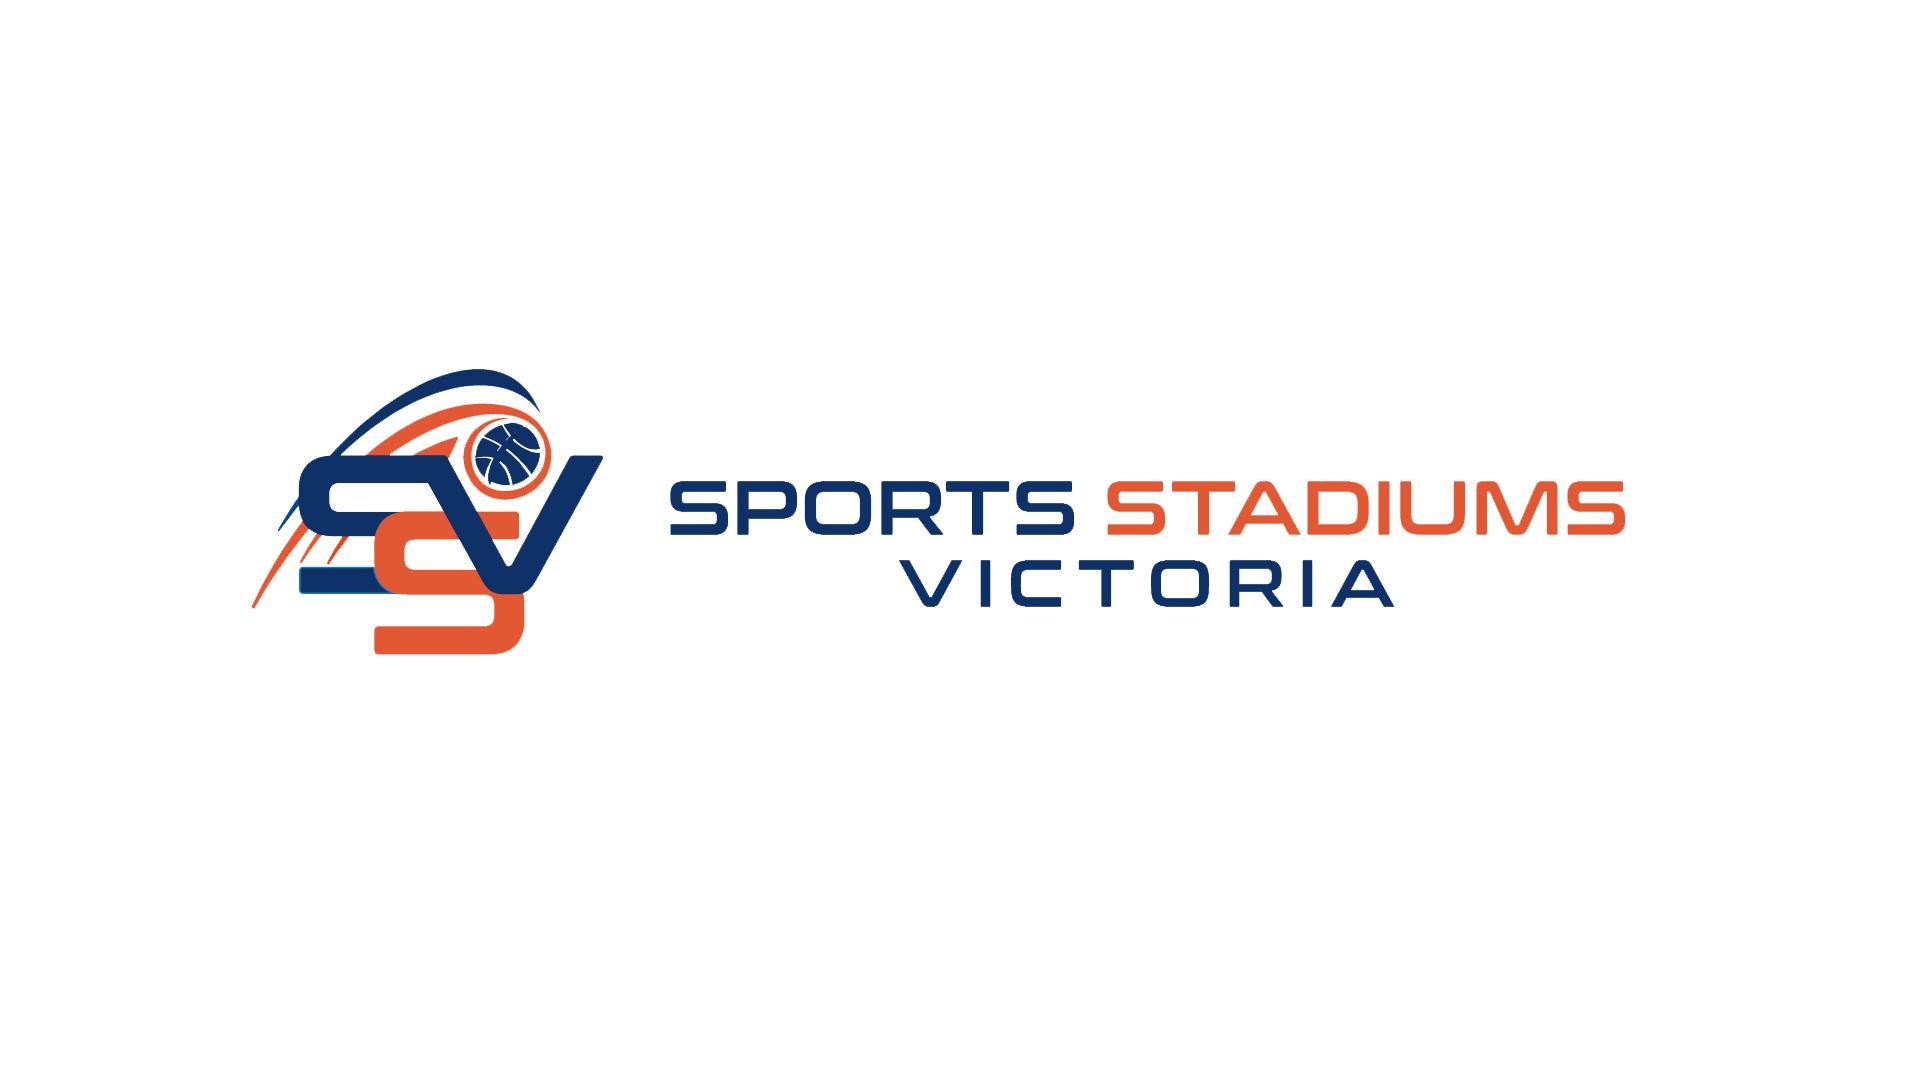 Home - image new_logo_slide on https://www.sportsstadiumsvictoria.com.au